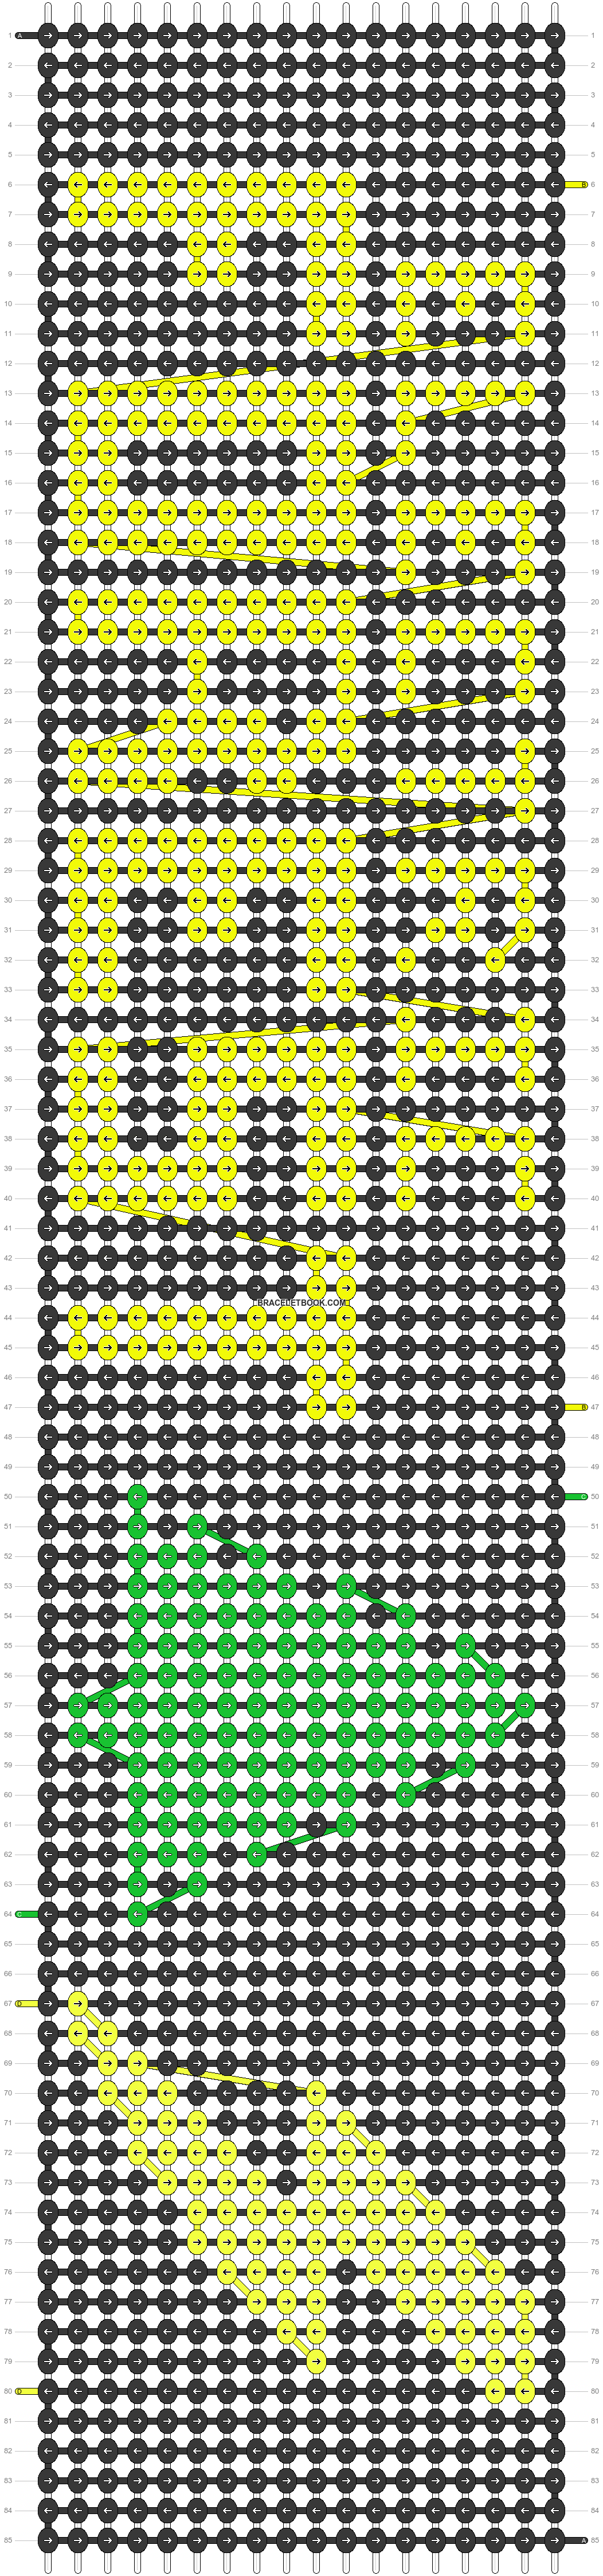 Alpha Pattern #22426 added by jazis119